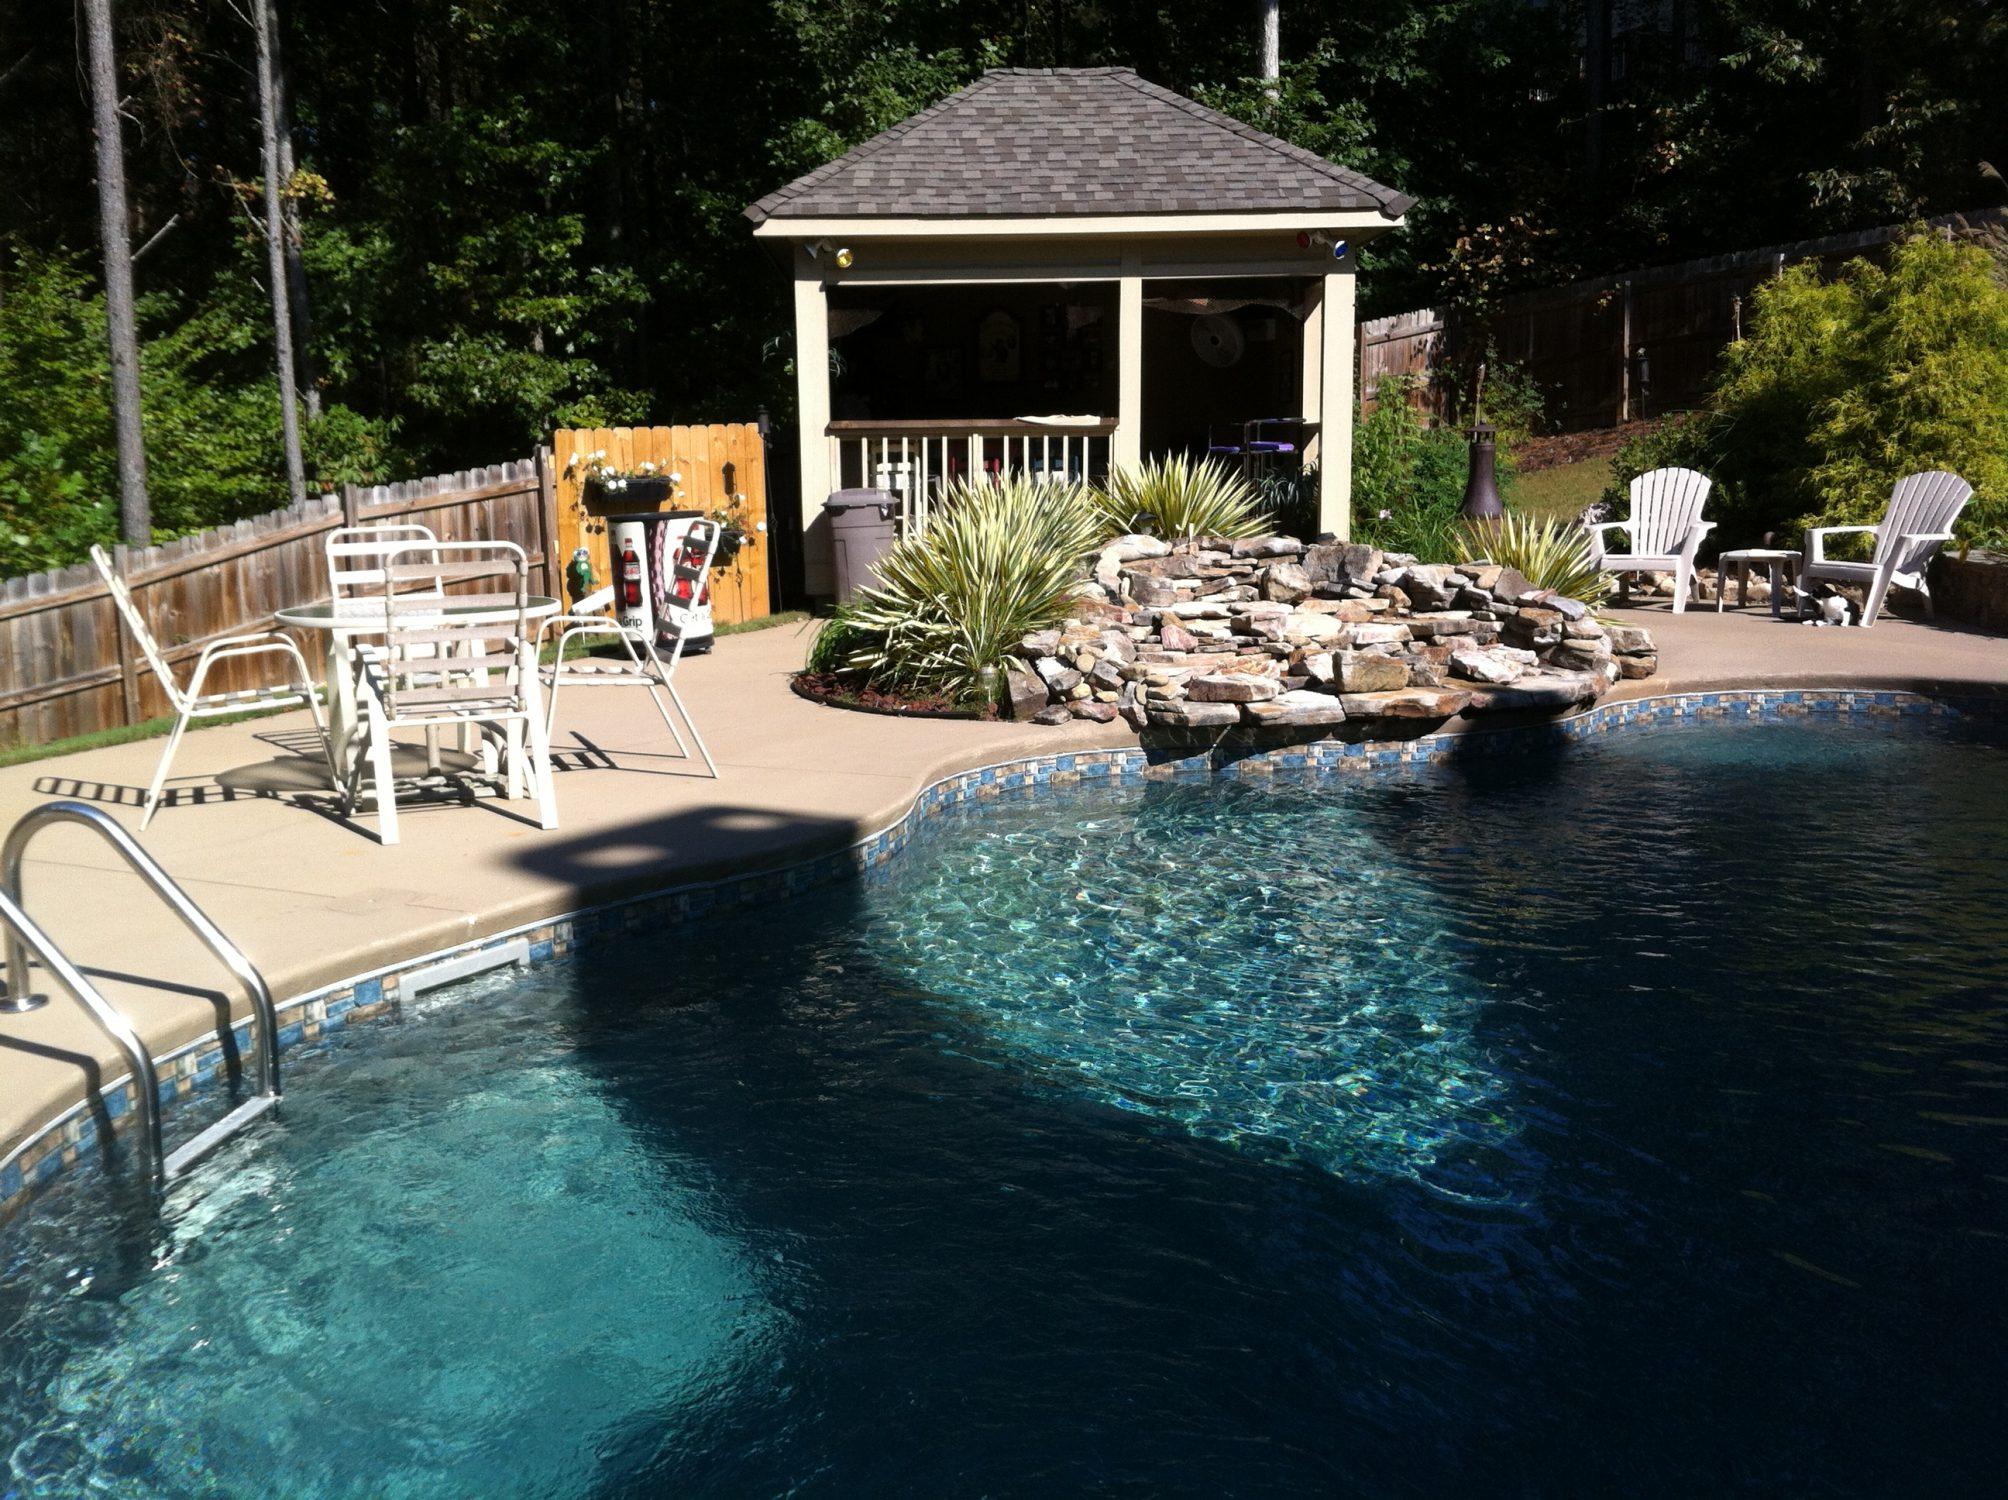 Aqua Fun Swimming Pools Are North Atlanta S Premier Pool Builder And Designers